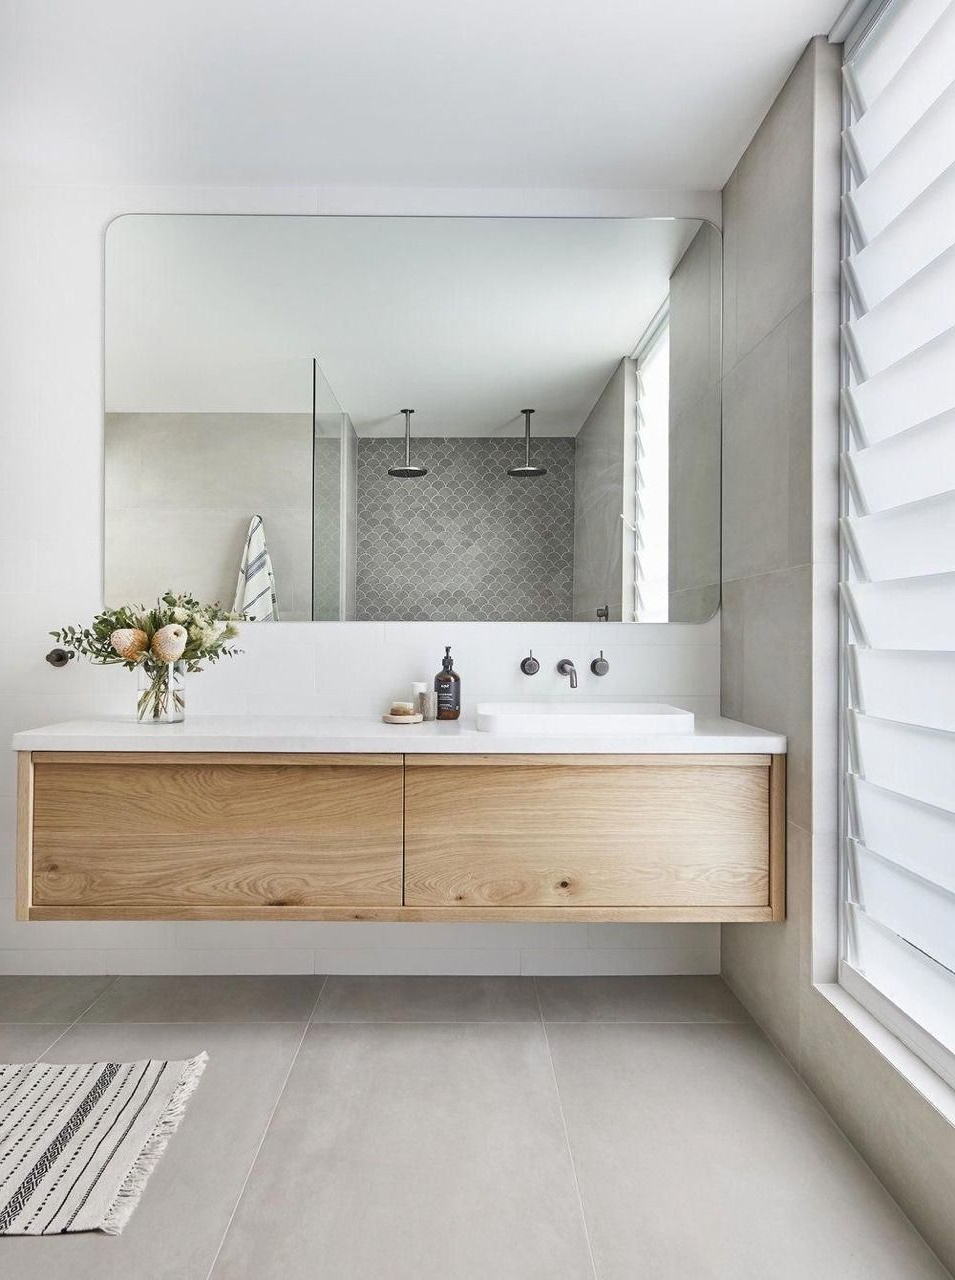 7 Interesting Bathroom Backsplash Ideas Design Ideas To